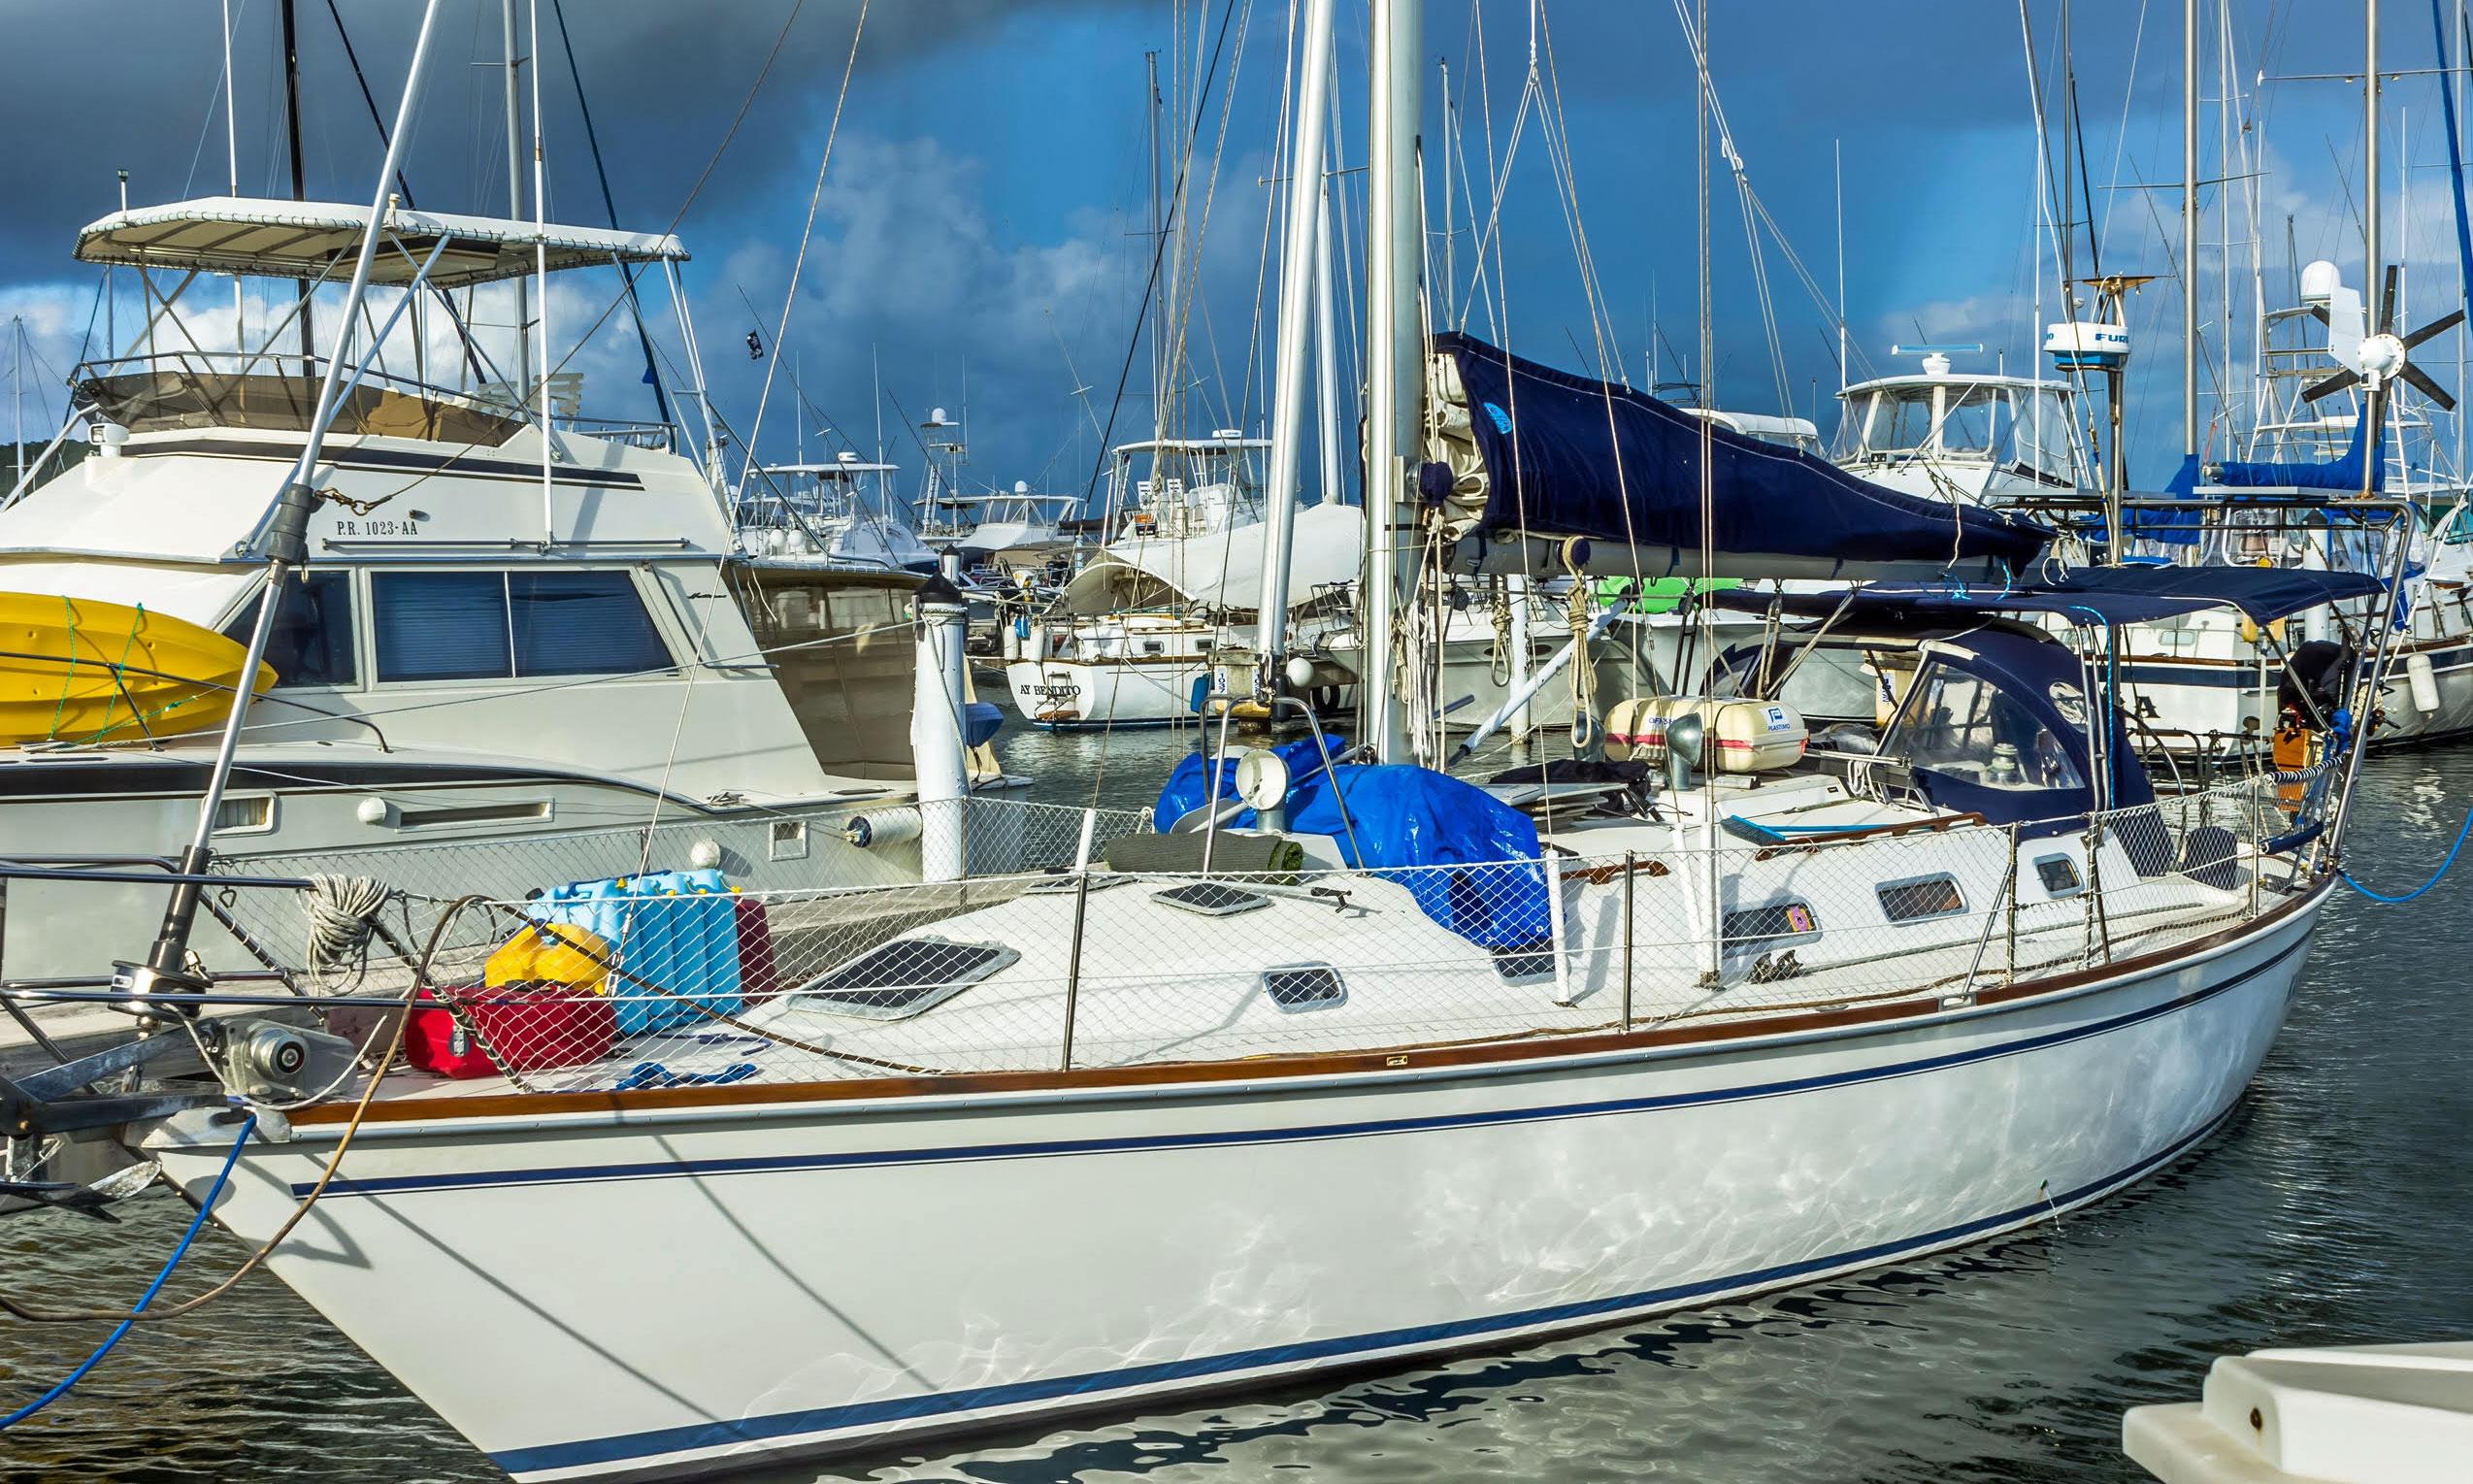 Pearson 38 sailboat